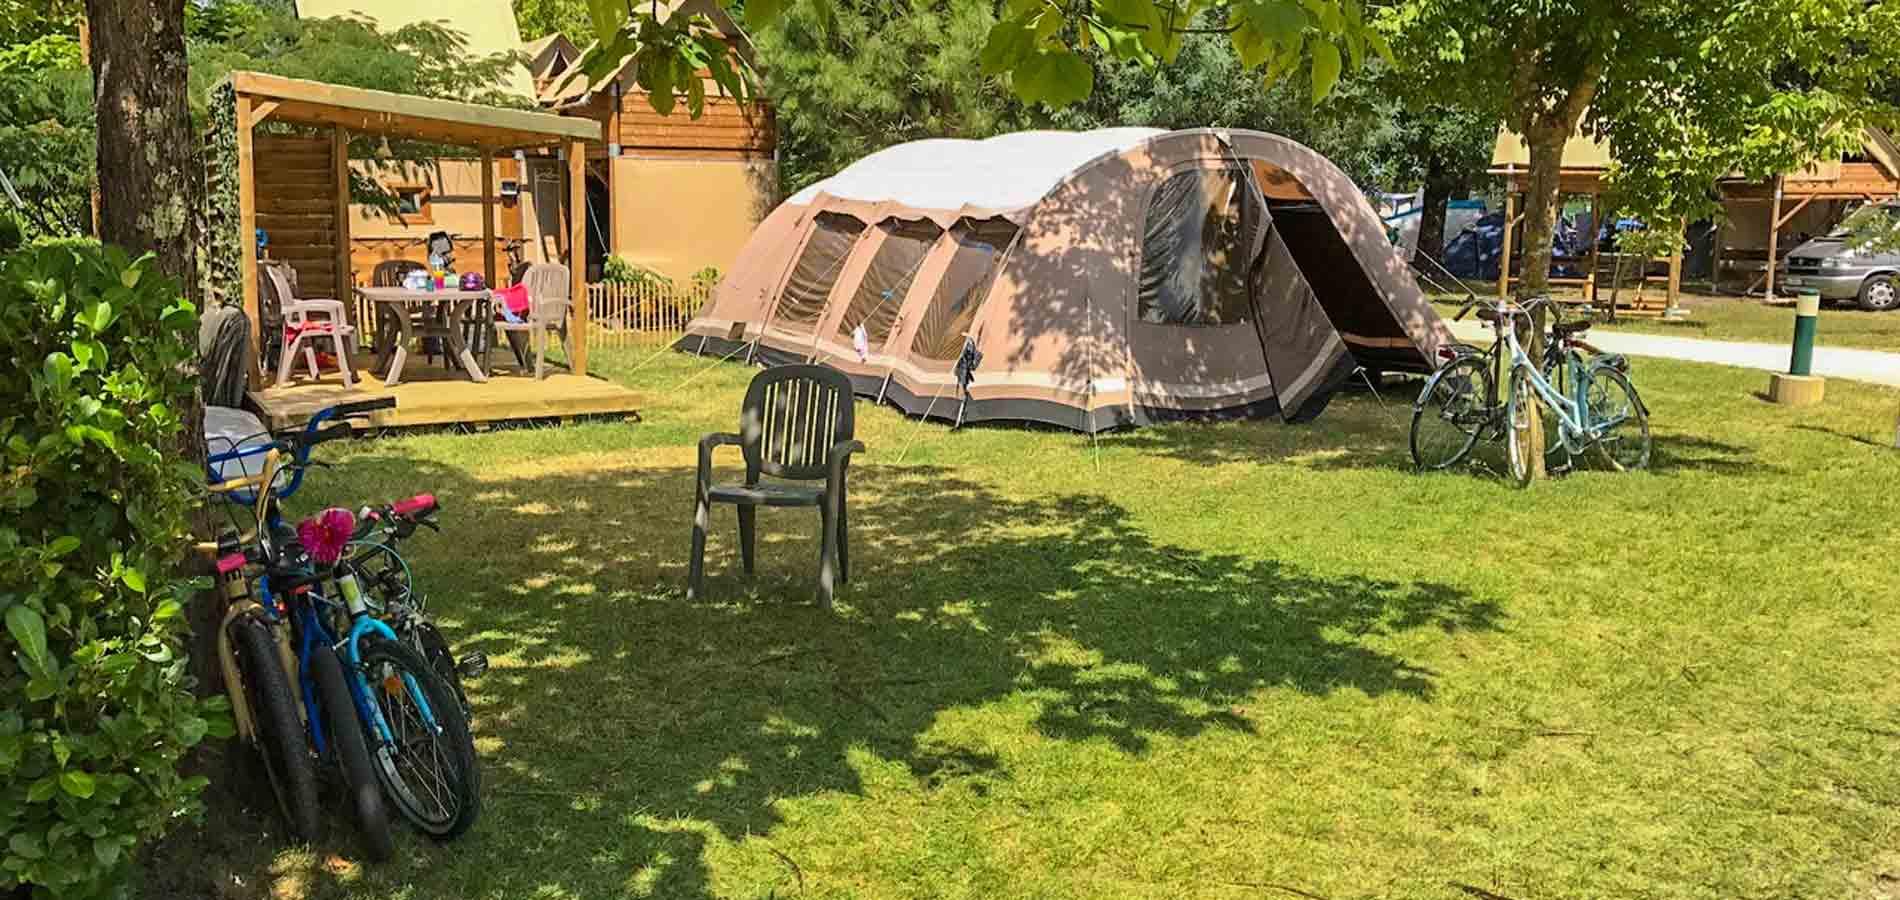 Camping Site Gironde Camping Caravaning Holidays Hourtin 33